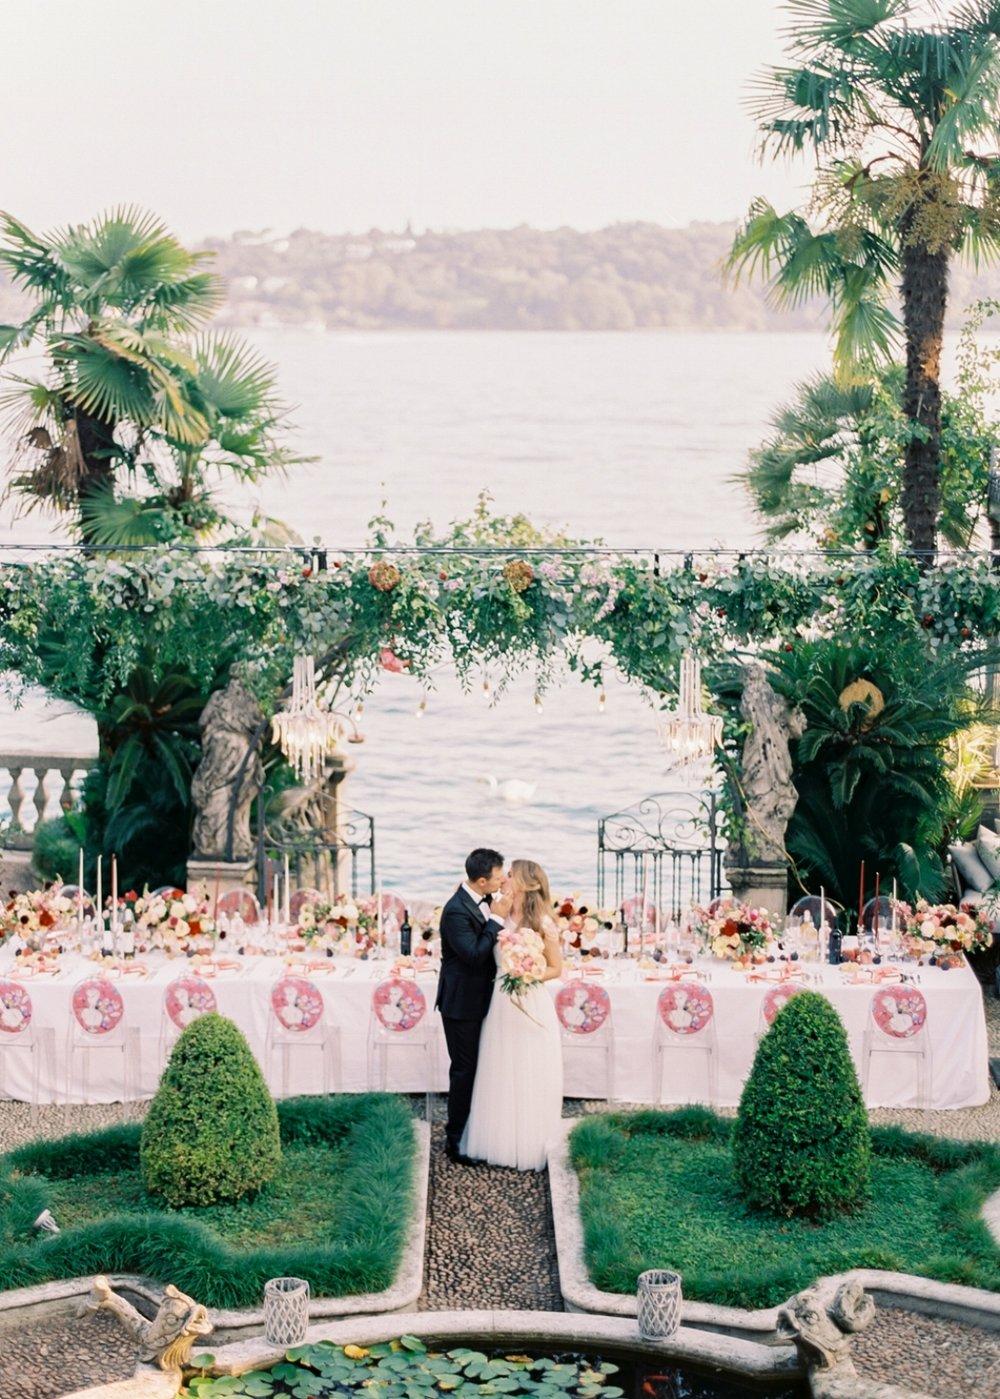 Nataly&Ivan, Garda, Italy (full wed)